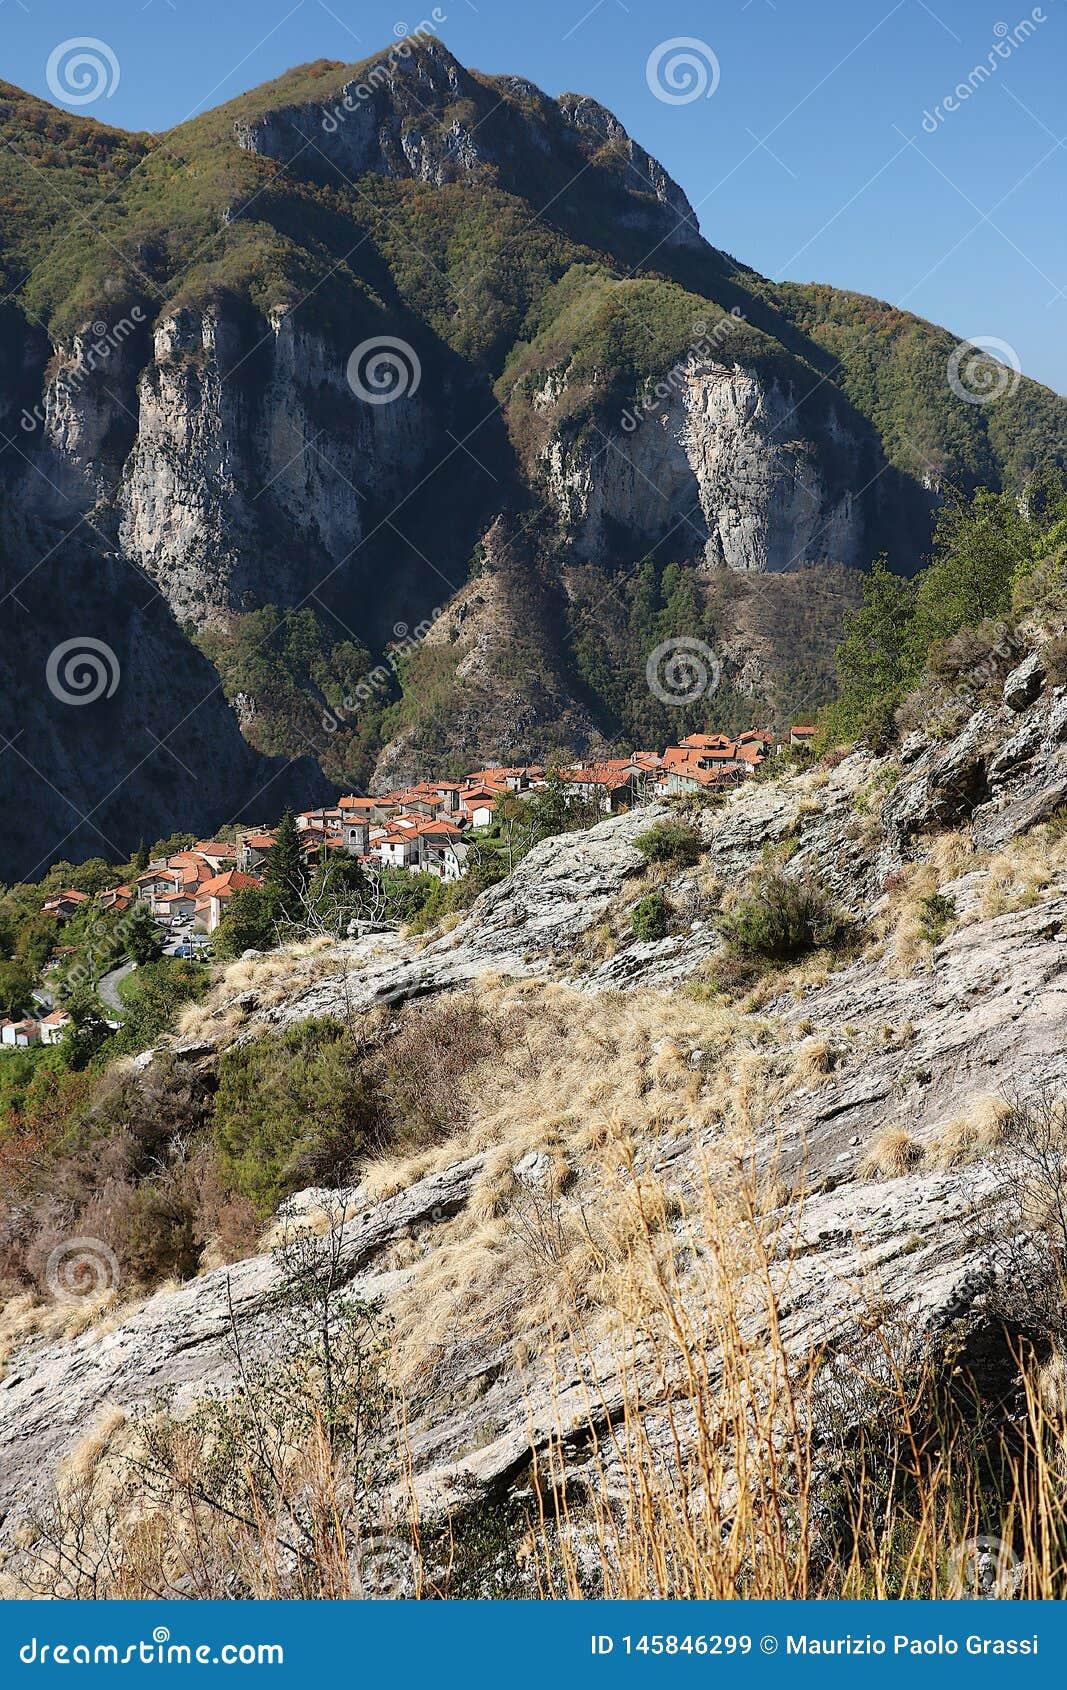 Alpi Apuane, Massa Carrare, Toscane, Italie Vue panoramique de Th